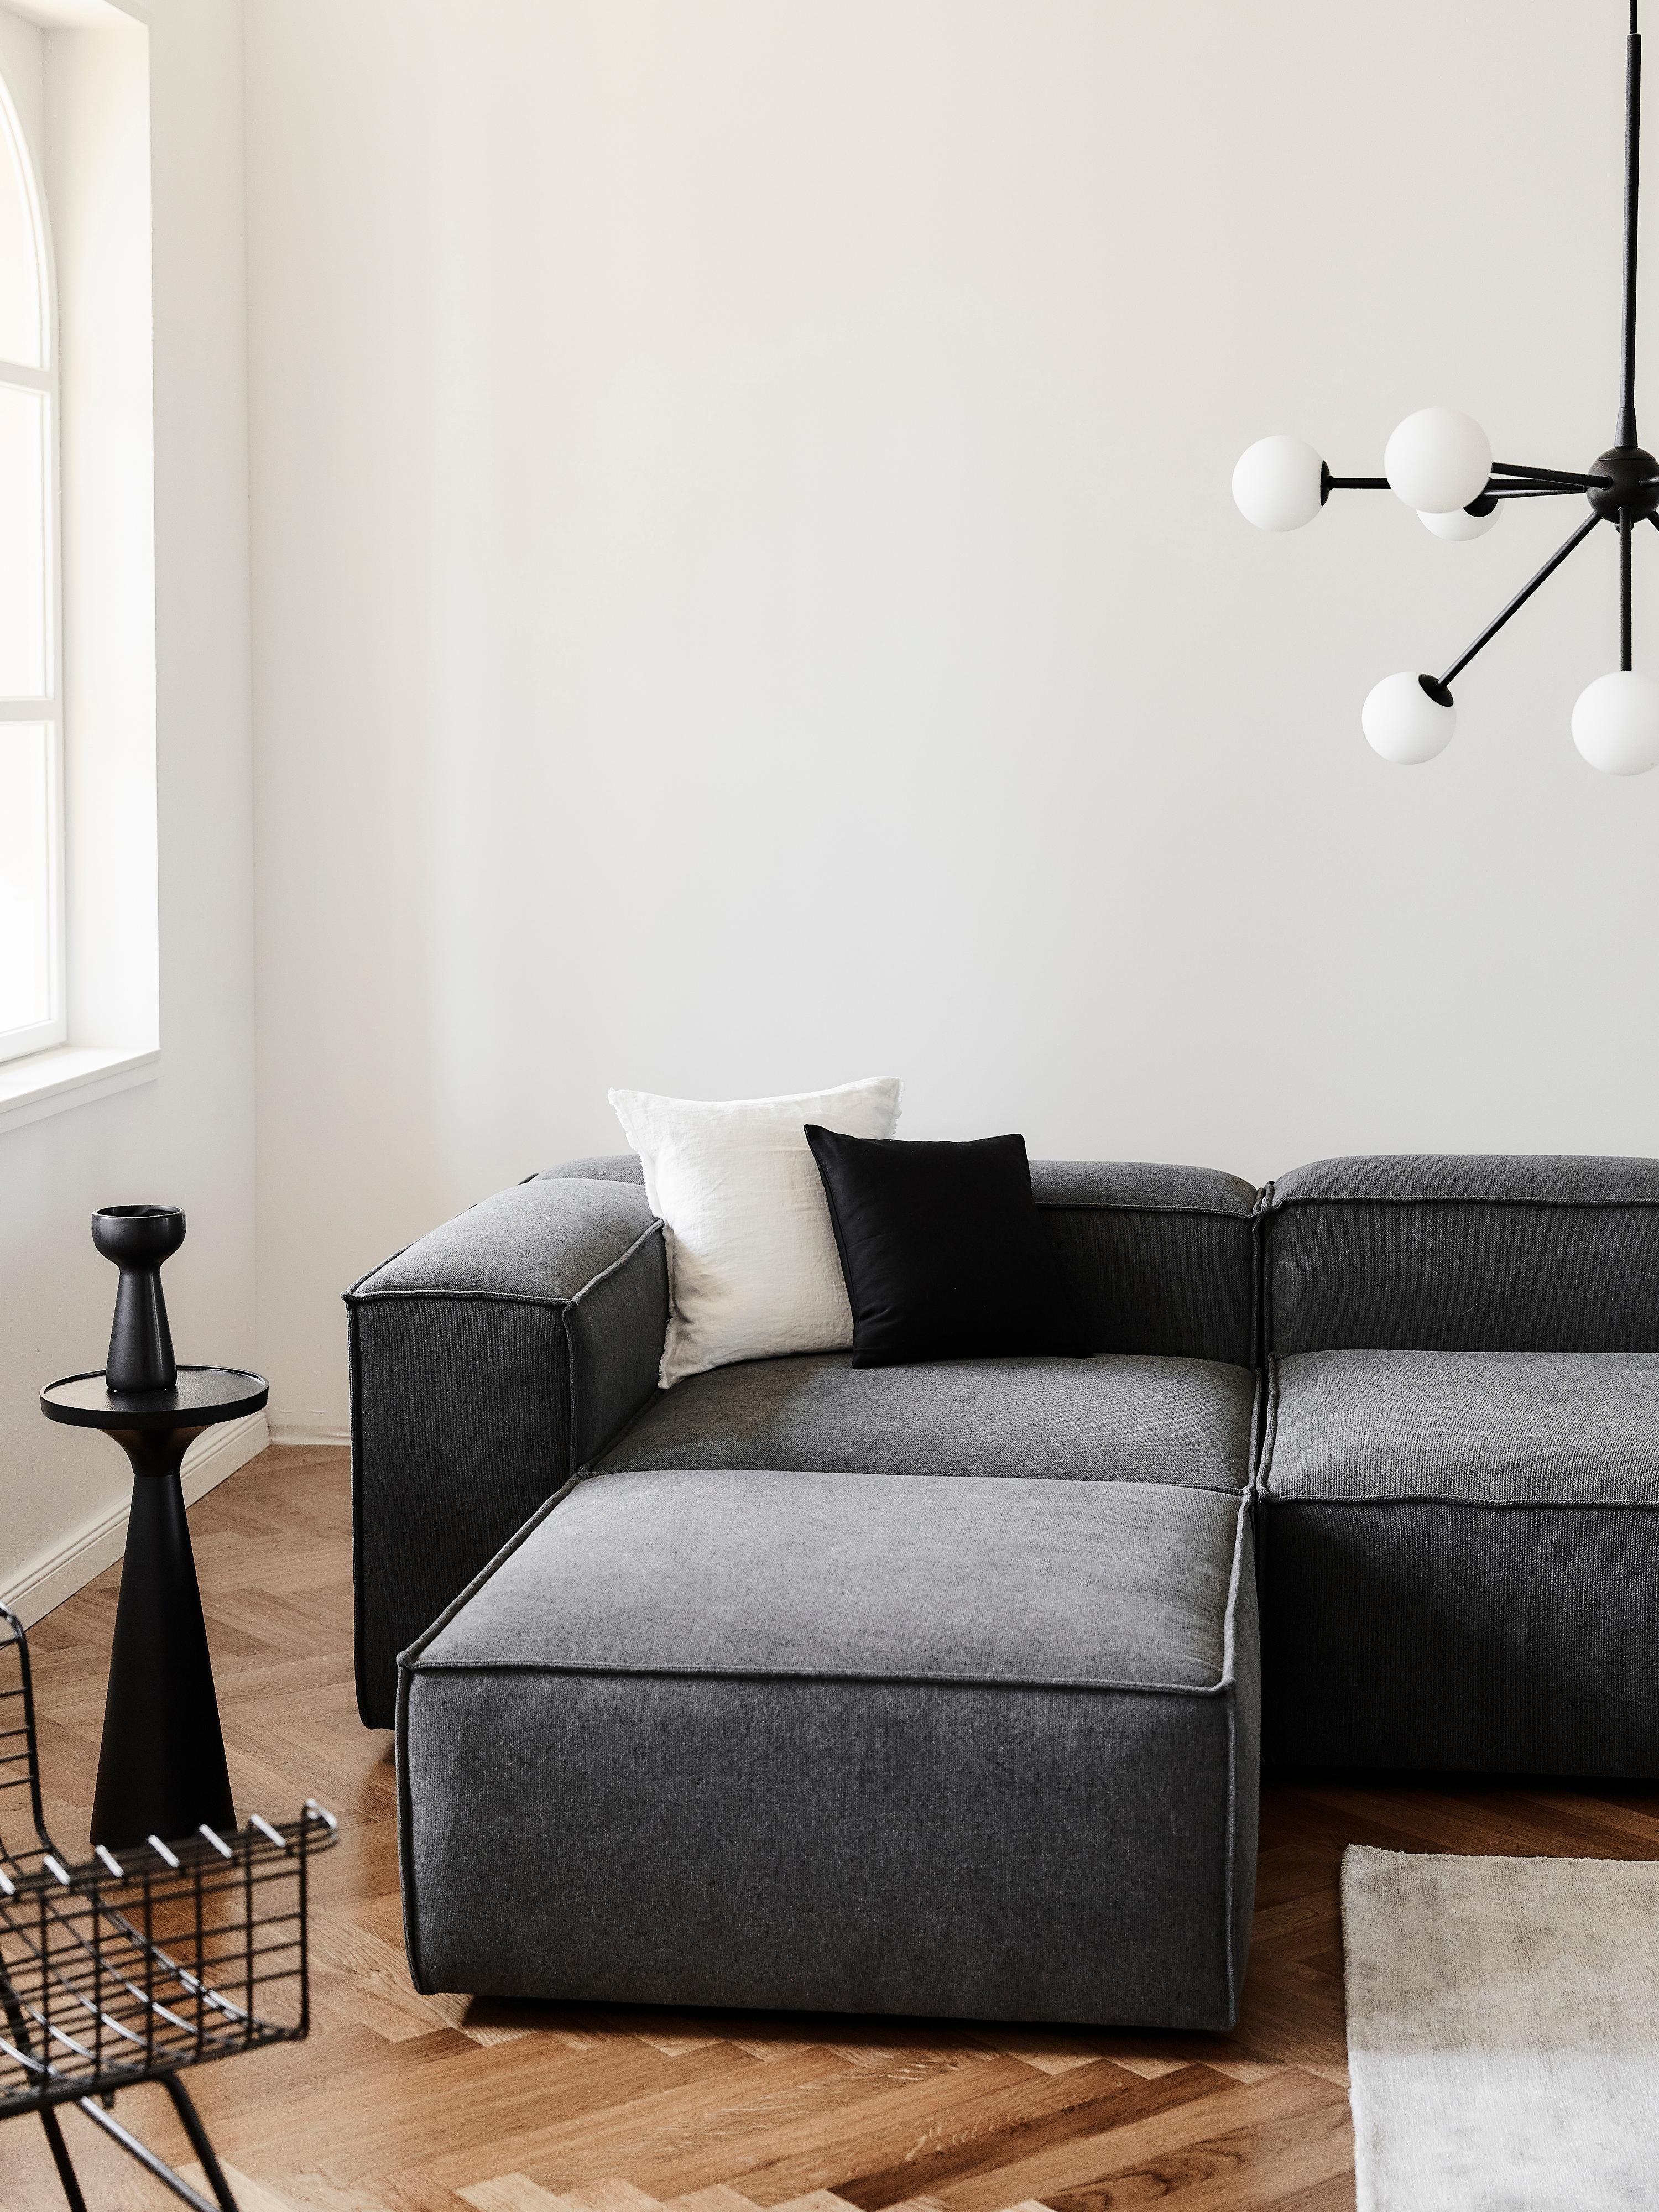 Modulares Sofa Lennon 4 Sitzer Mit Hocker In Anthrazit Westwingnow Modulares Ecksofa Westwing Sofa Mobel Wohnzimmer